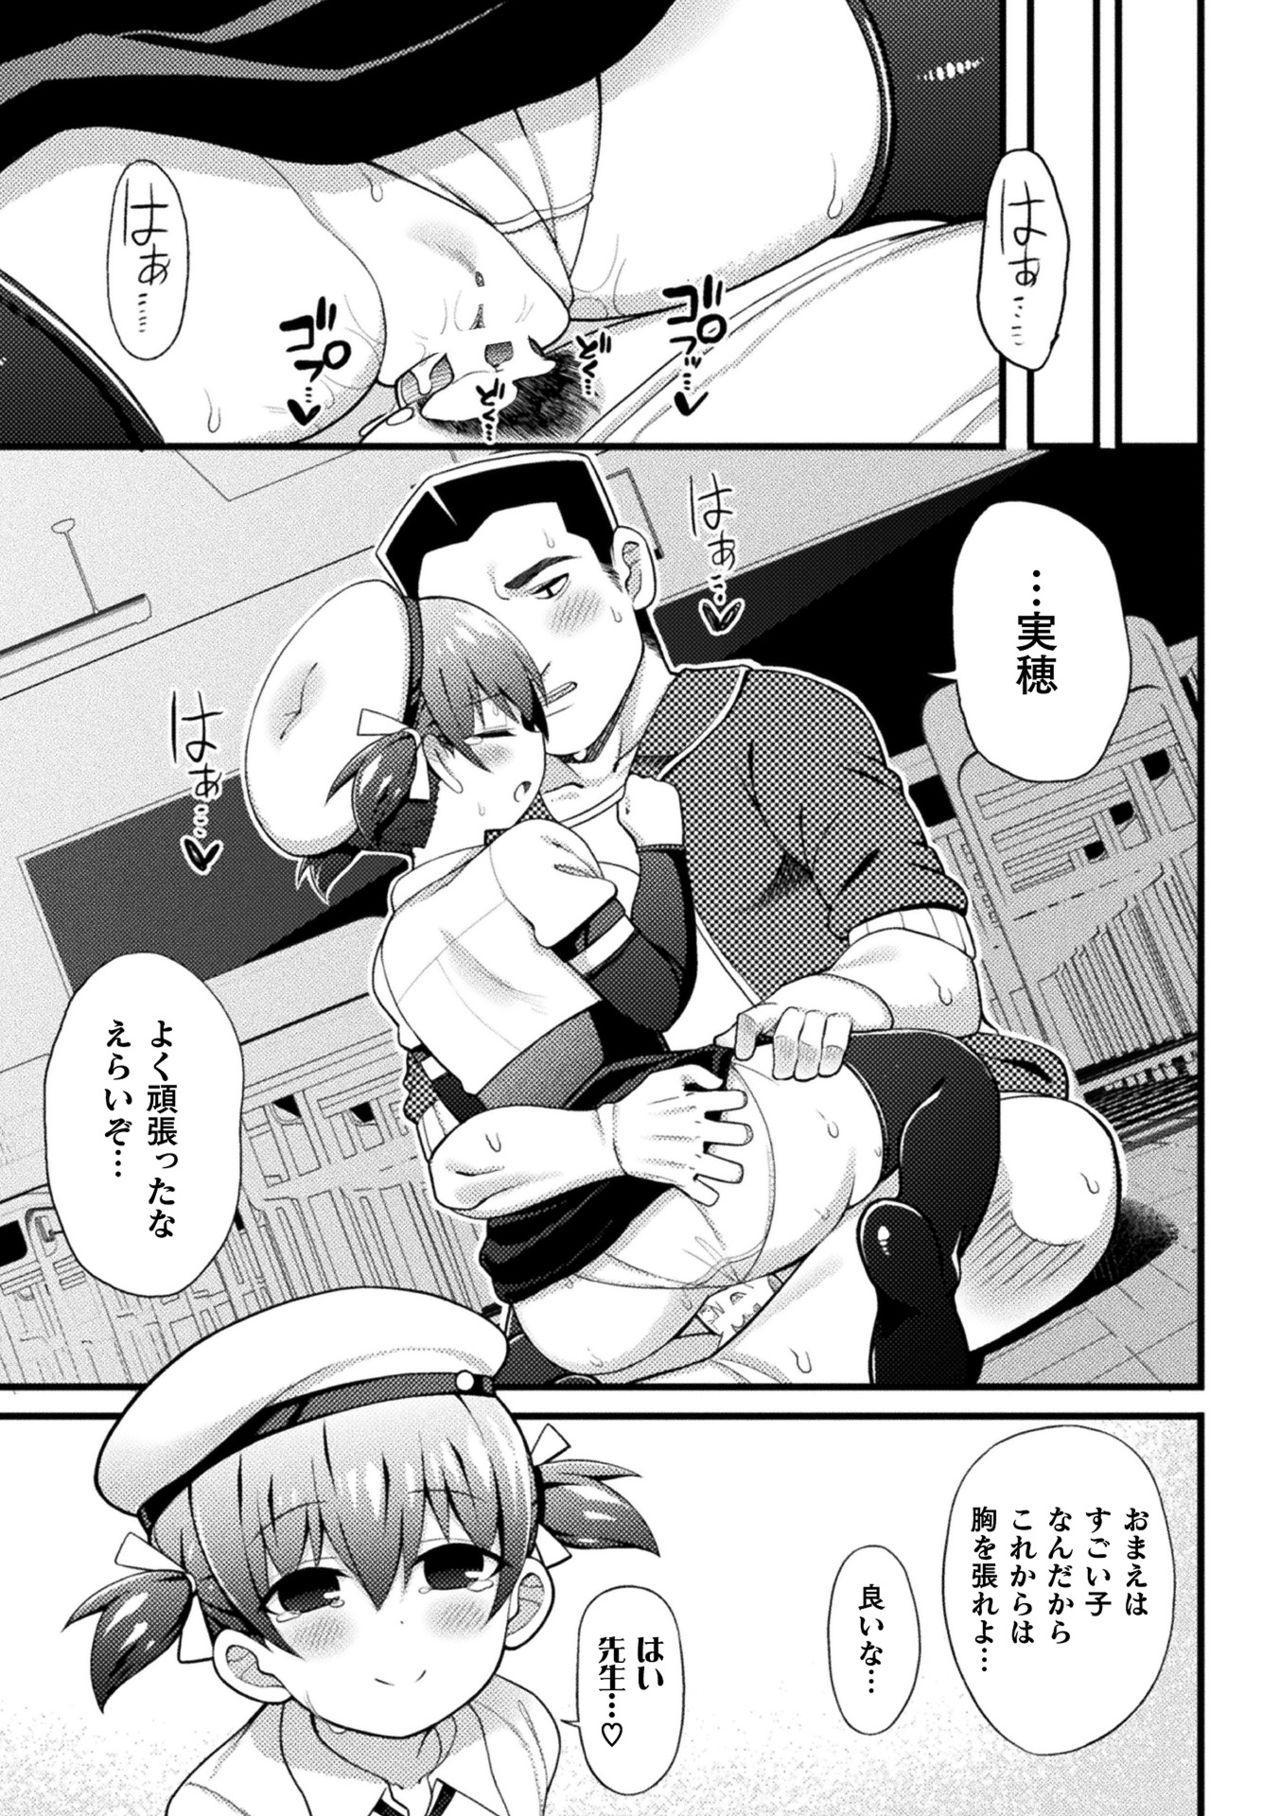 2D Comic Magazine Ero Chishiki 0 na Heroine Damashite Ryoujoku Muchix! Vol. 1 60